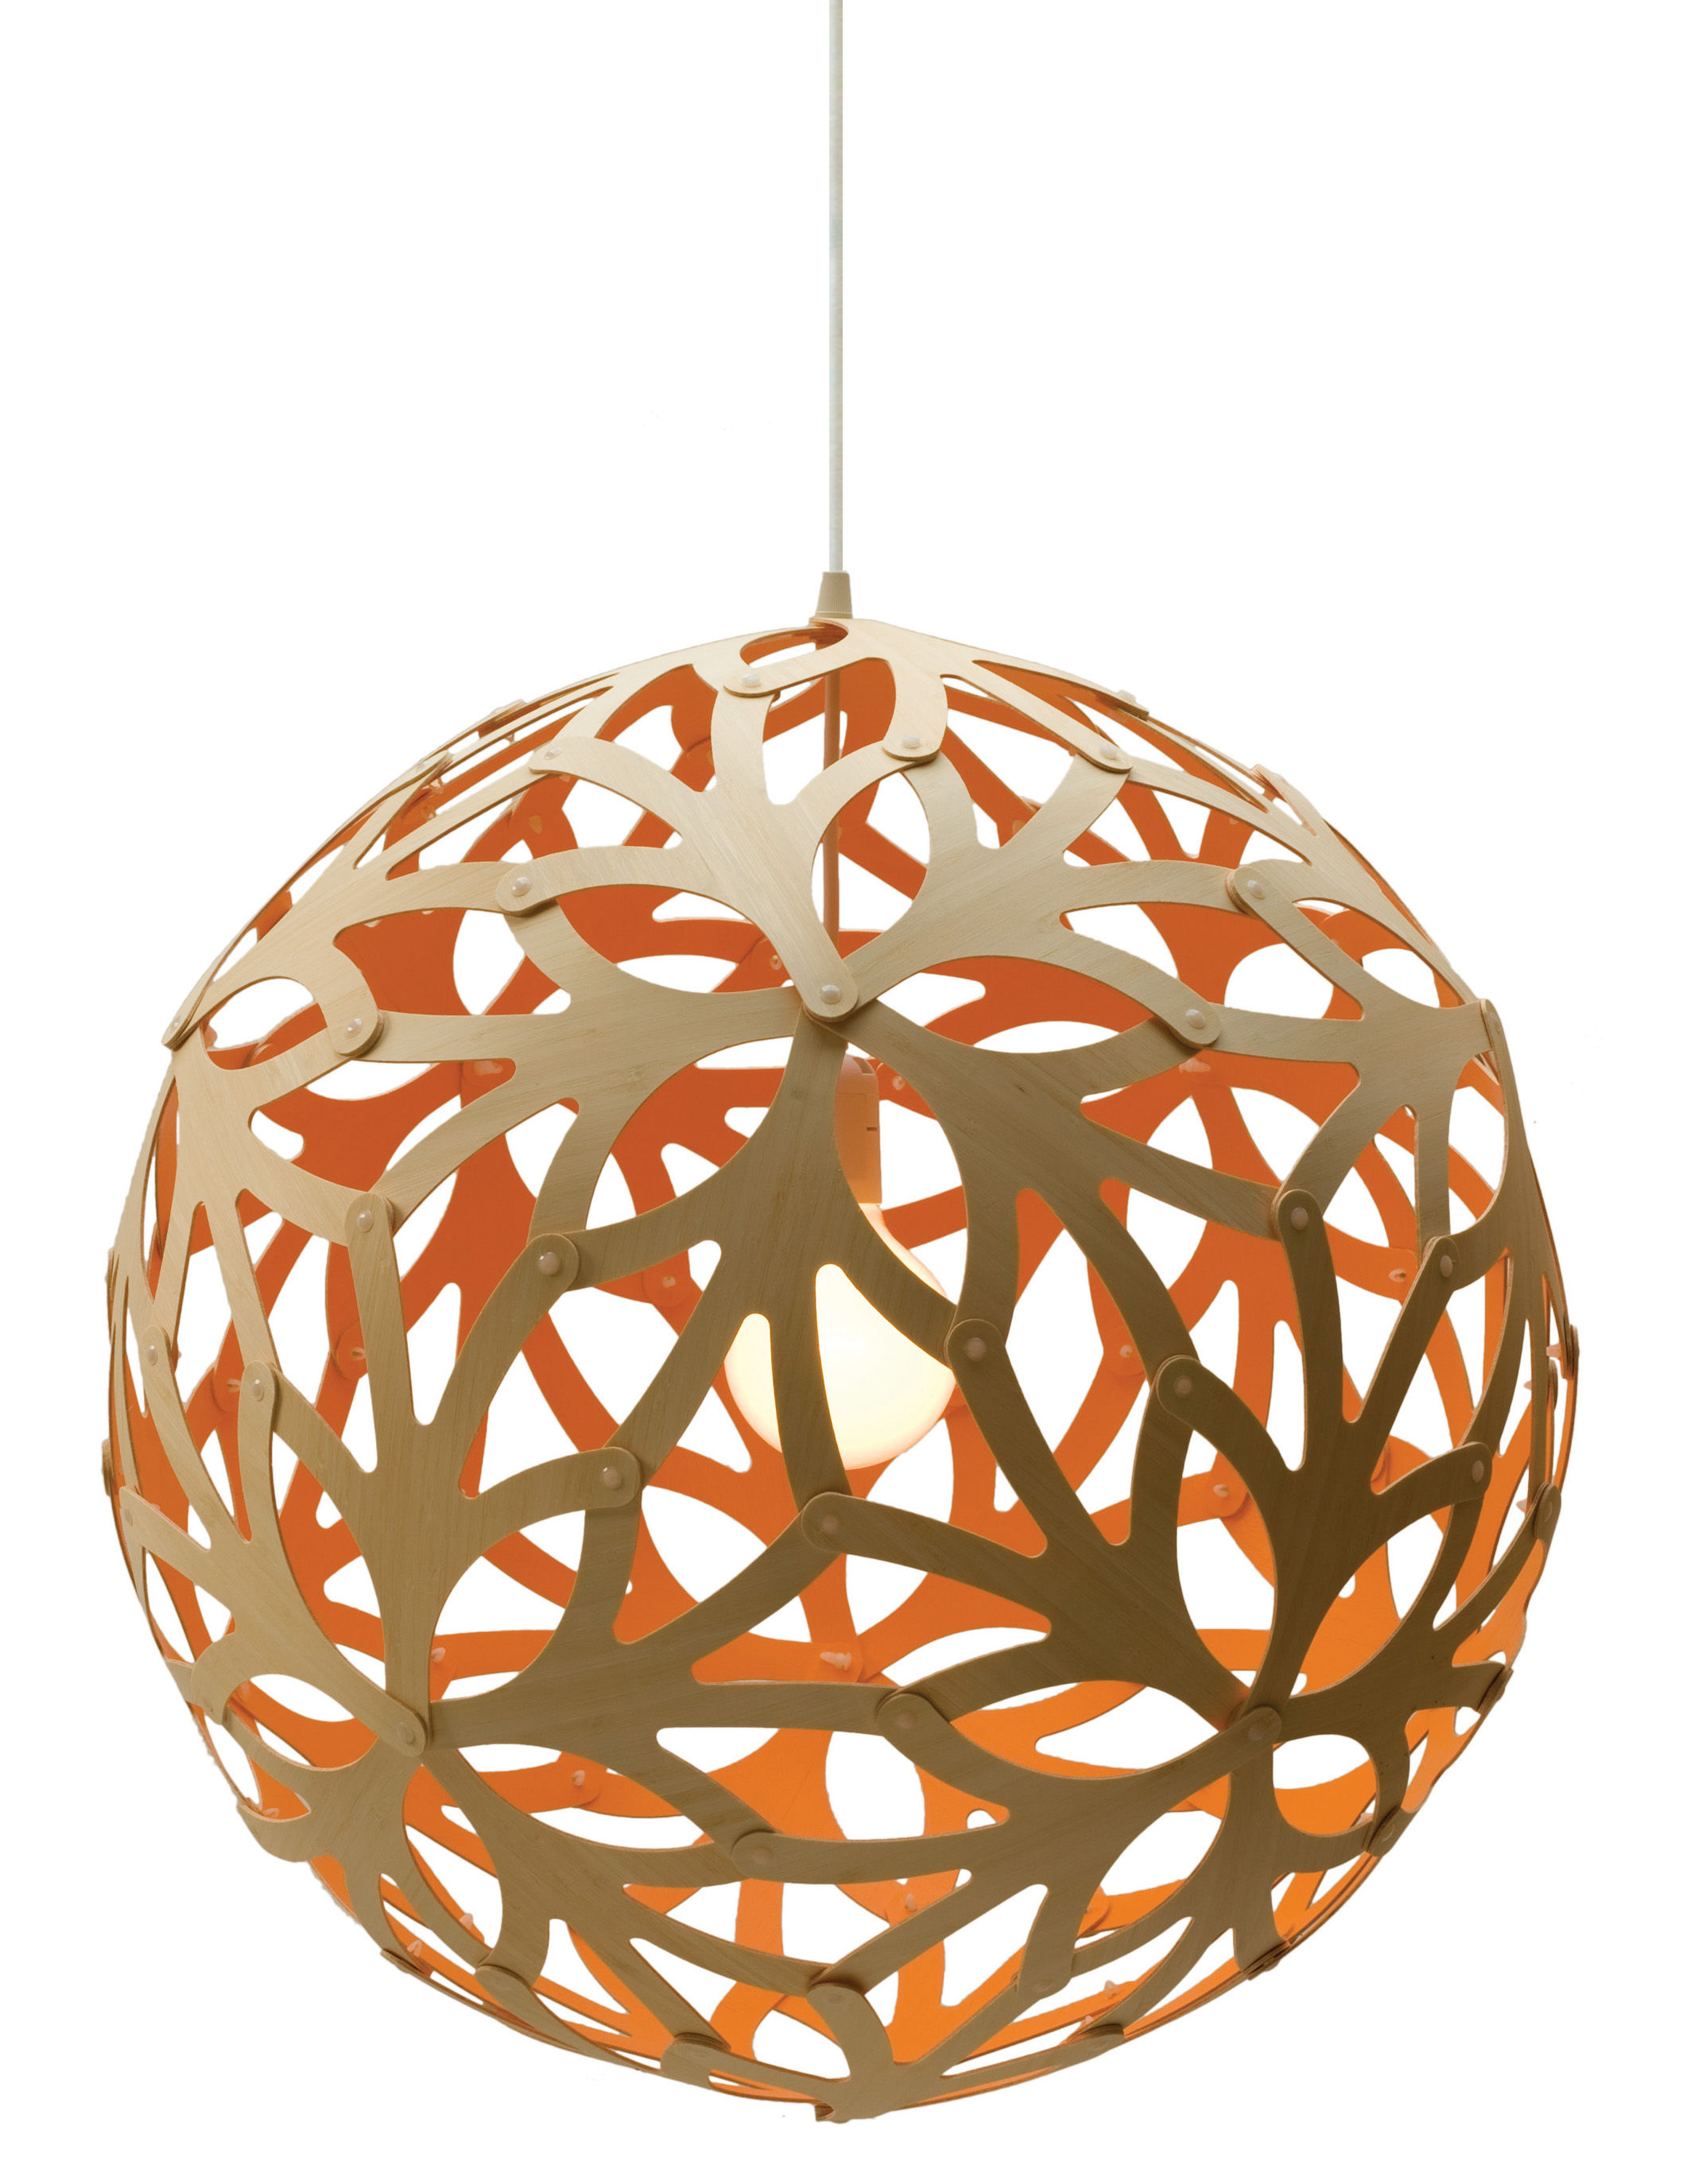 Lighting - Pendant Lighting - Floral Pendant - Ø 60 cm - Bicoloured by David Trubridge - Orange / Natural wood - Pine